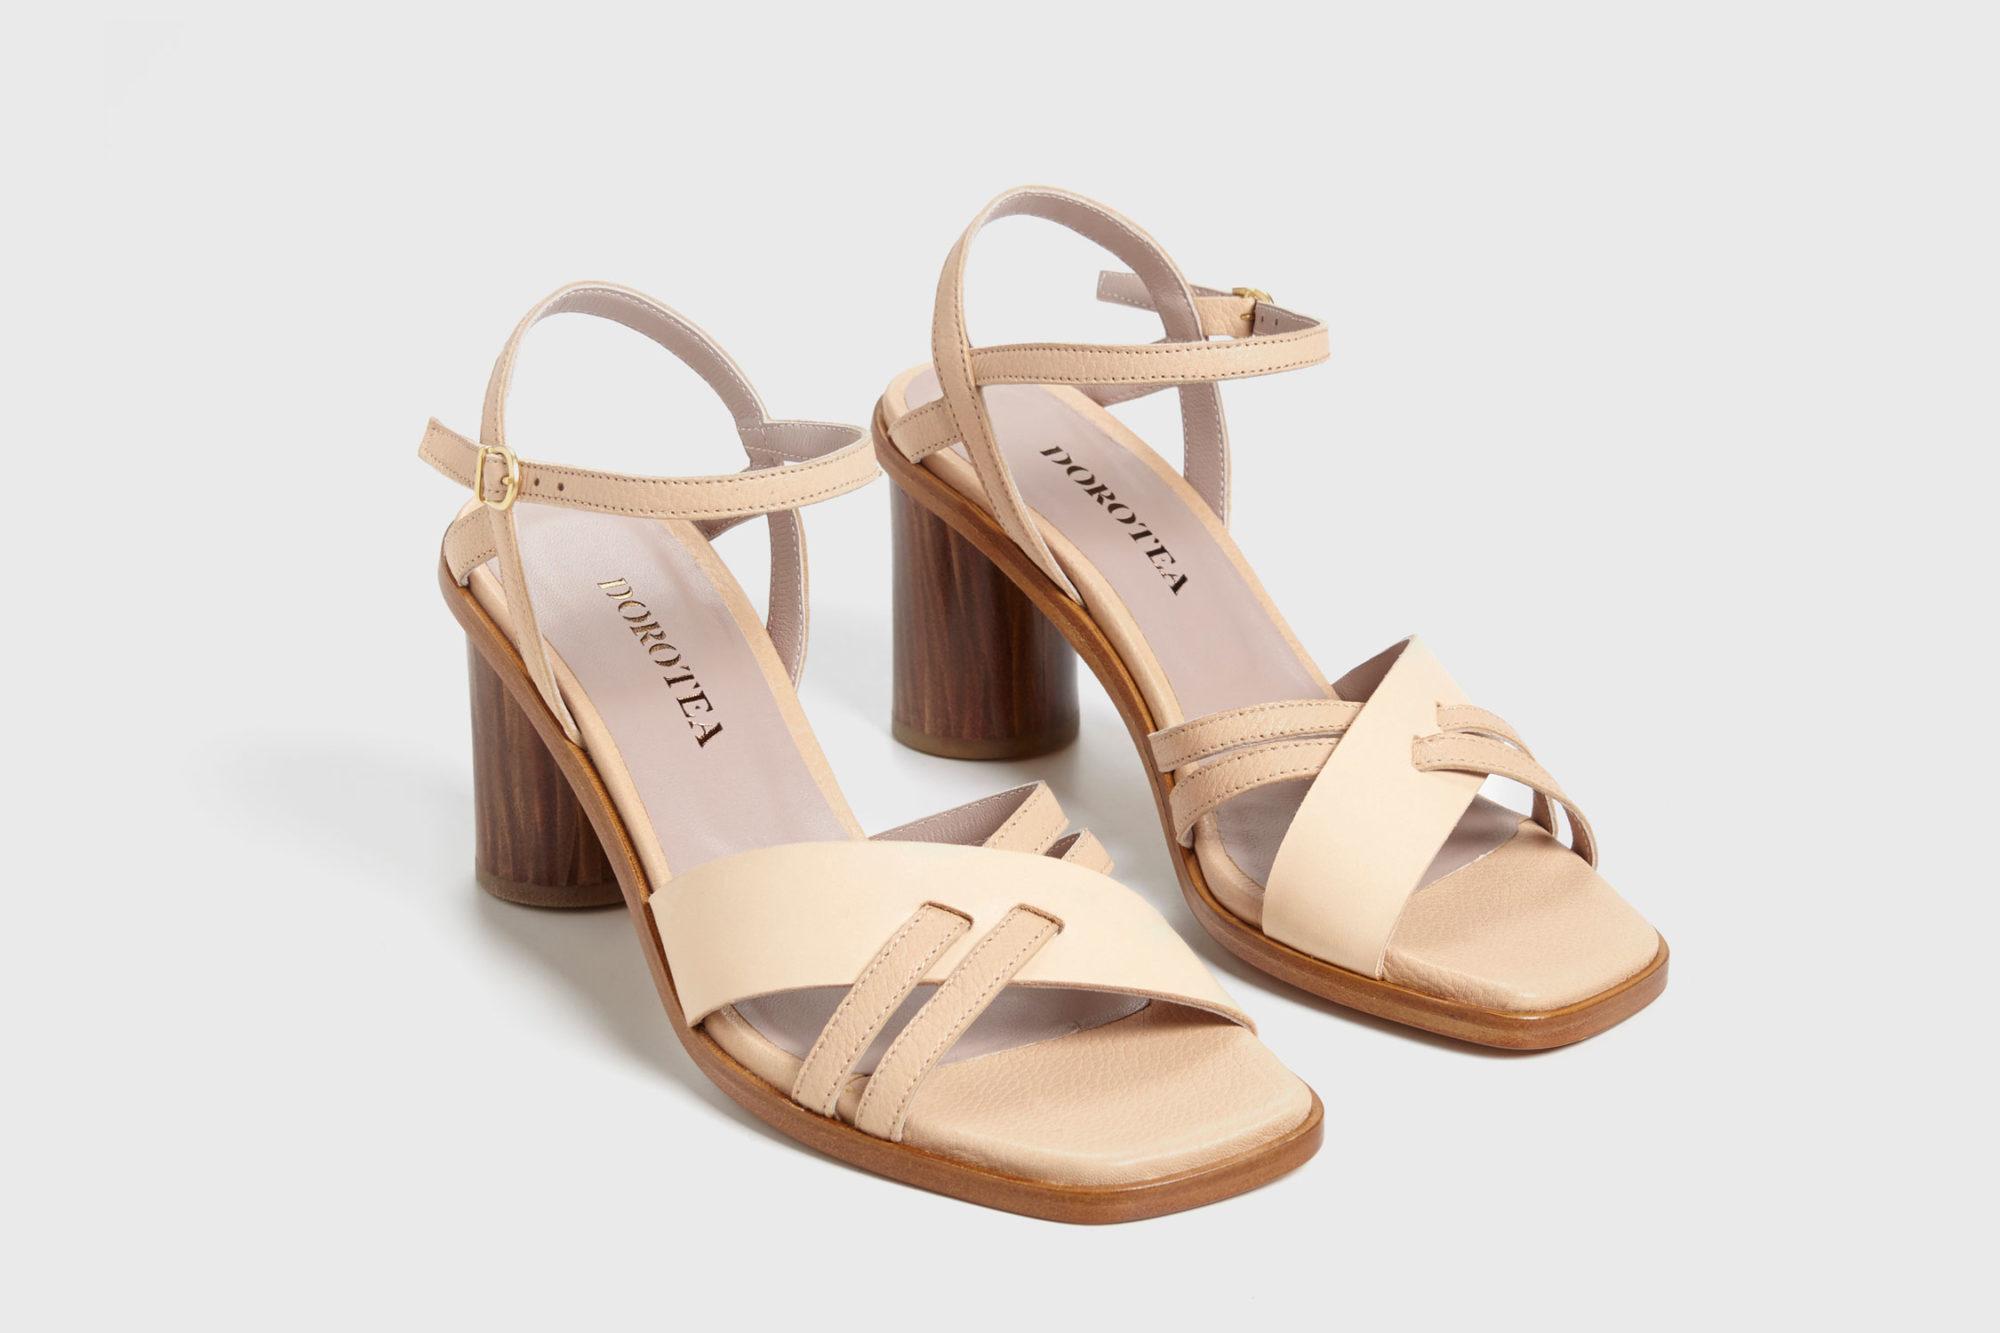 Dorotea sandalia de tacón alto Sophie nude ss17 par